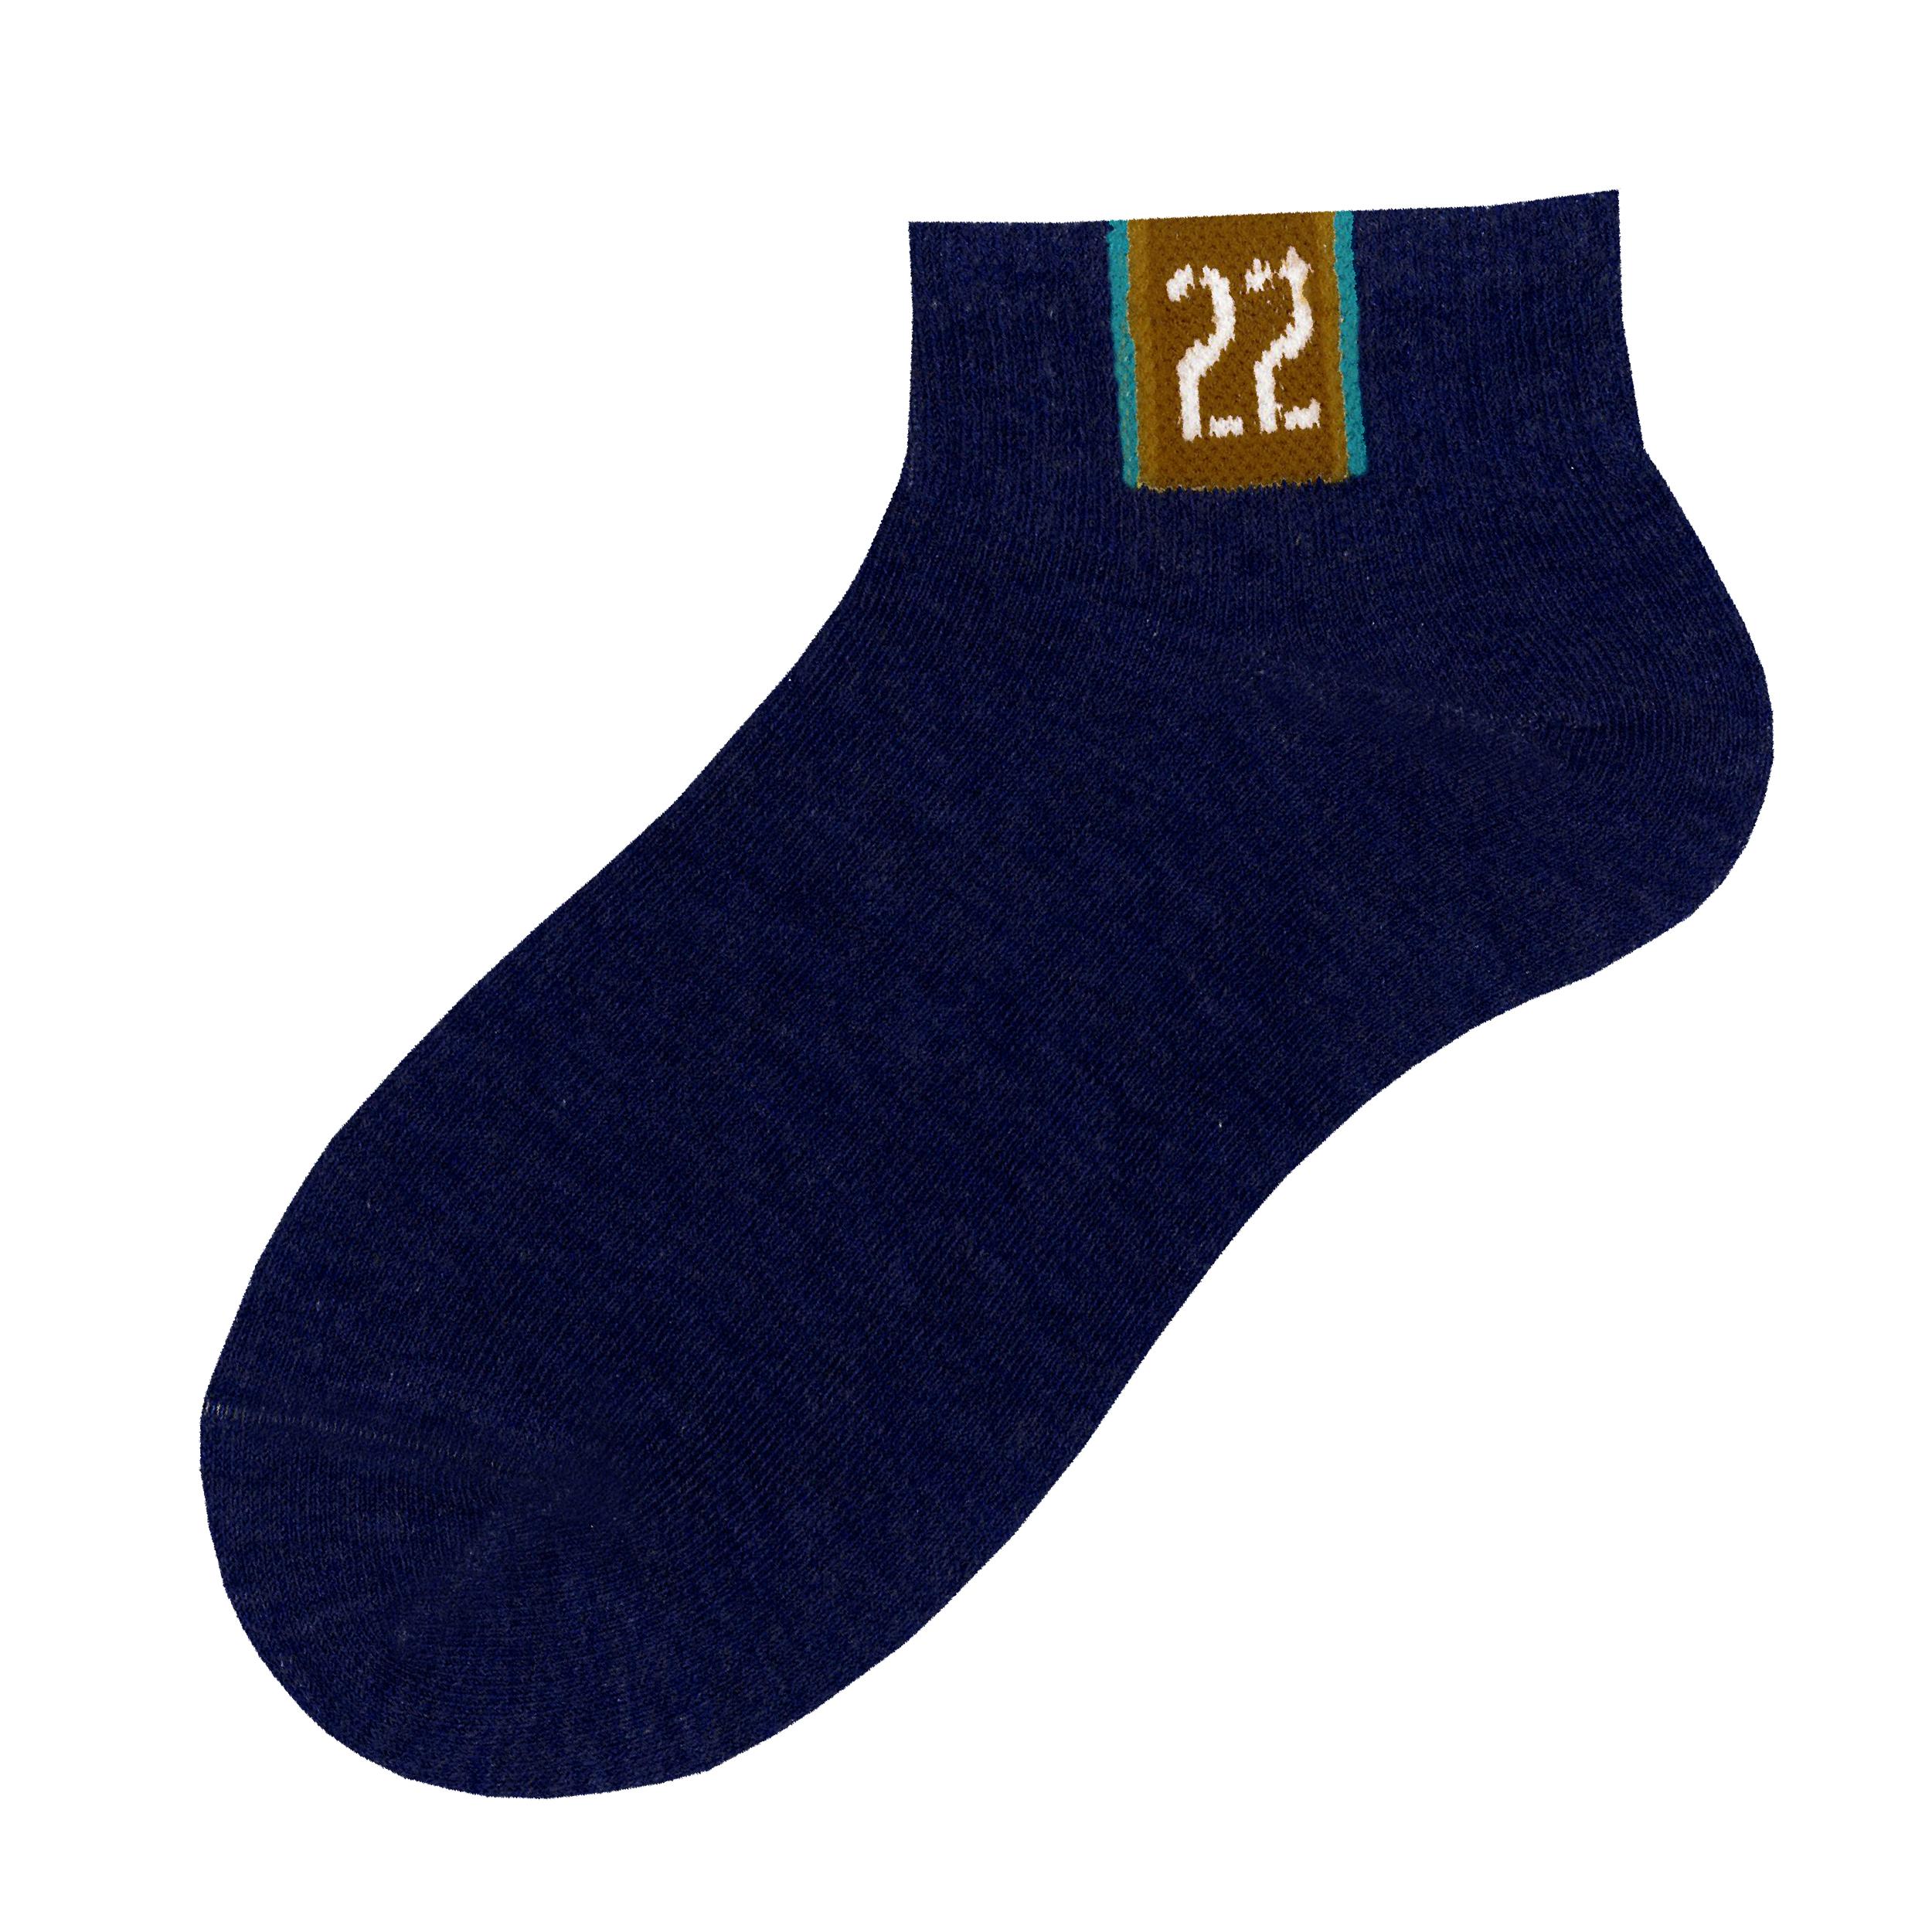 جوراب پسرانه دیزر طرح 22 کد fiory1057